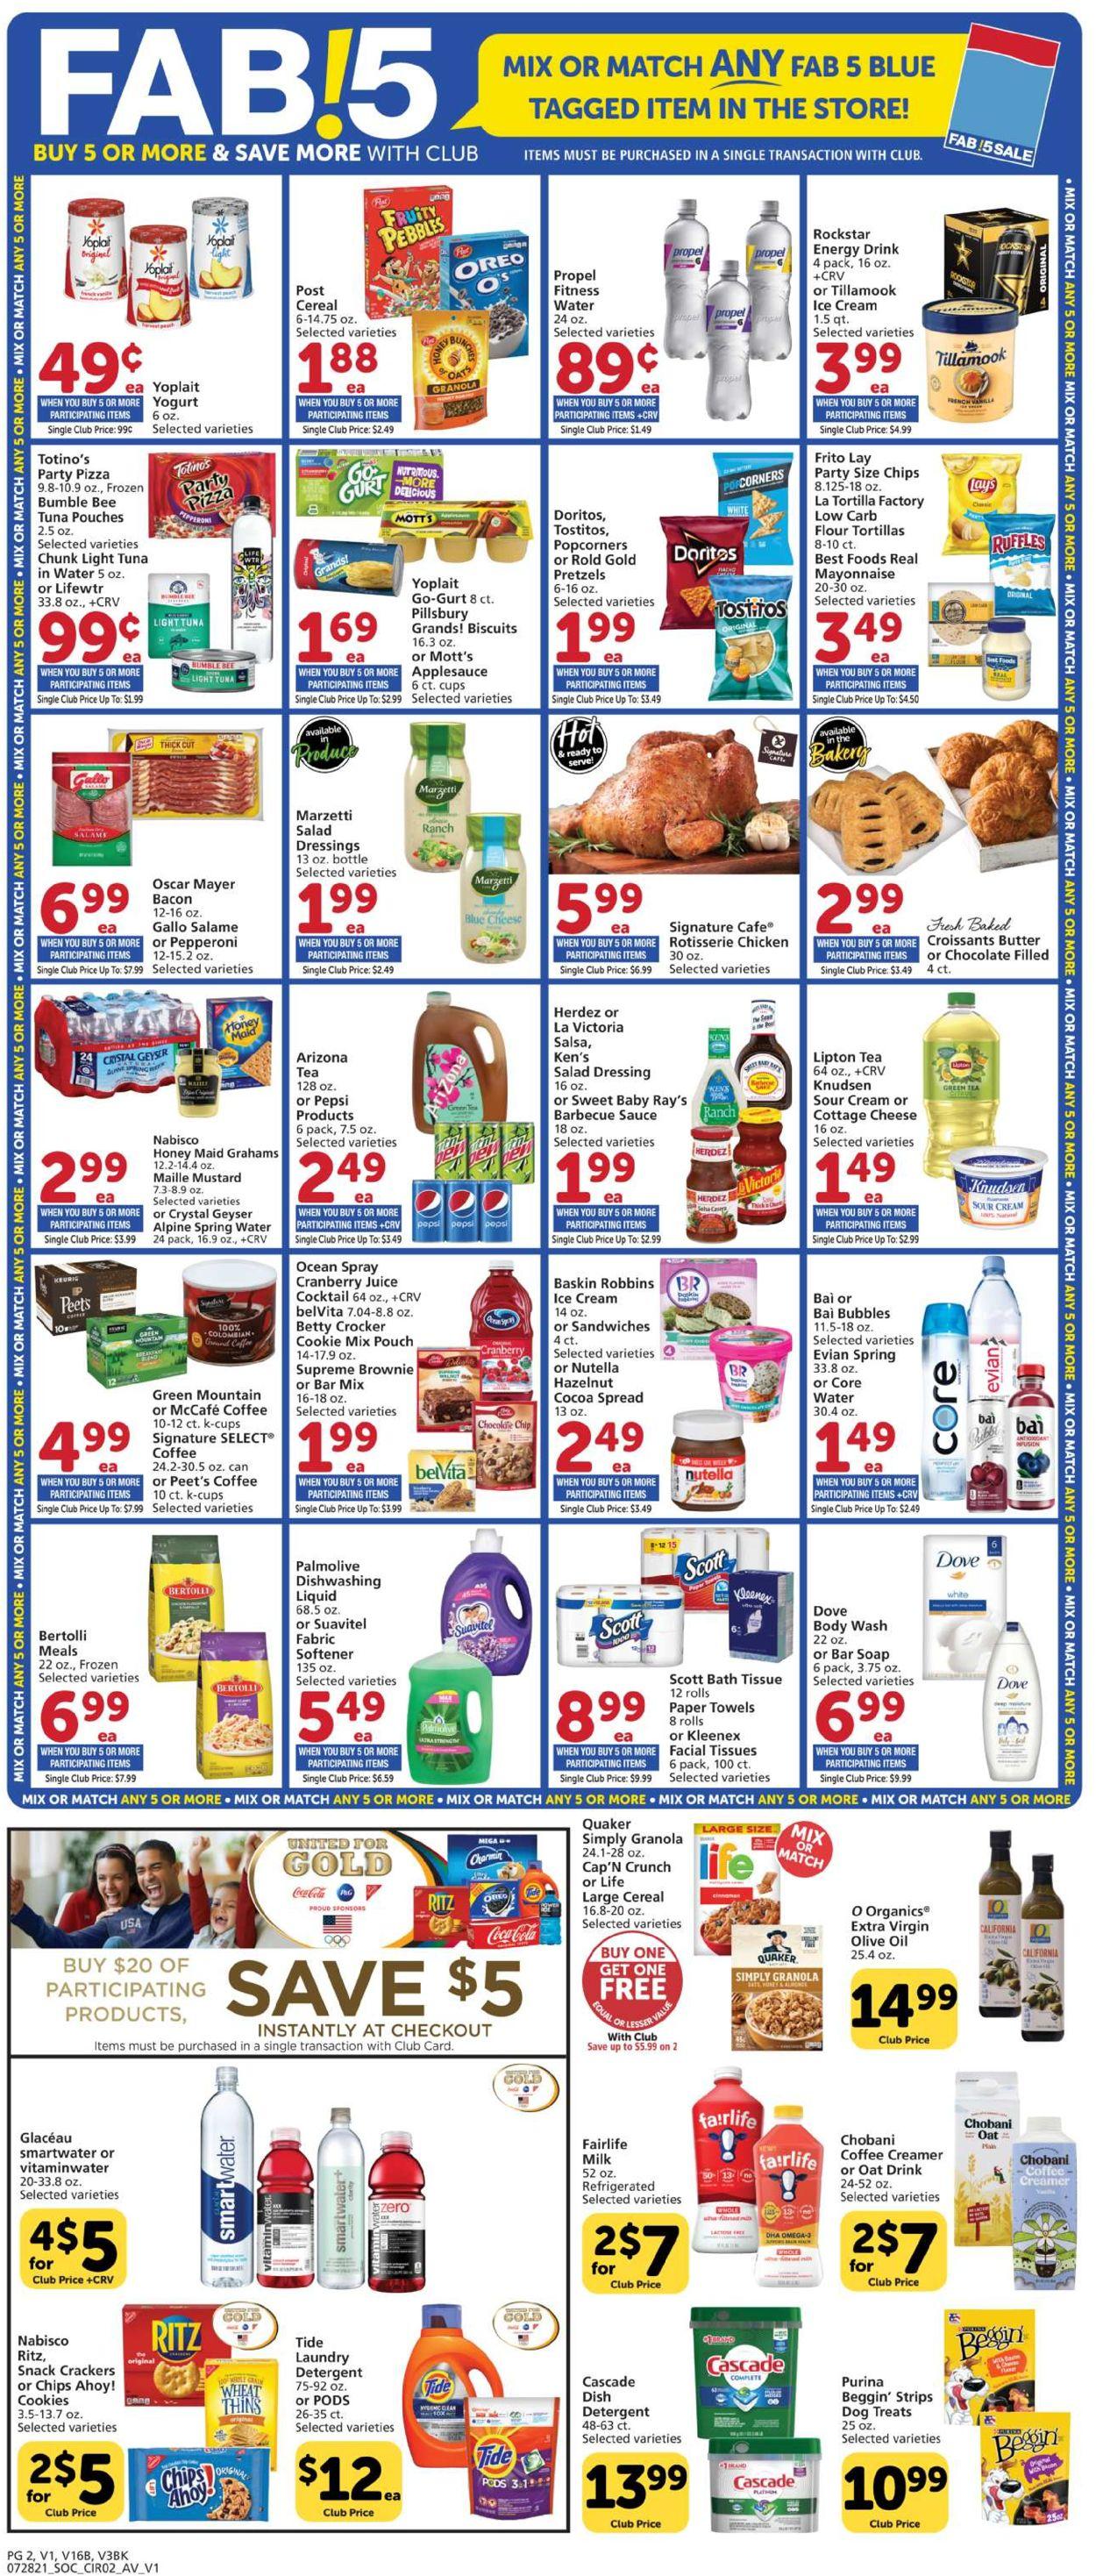 Vons Weekly Ad Circular - valid 07/28-08/04/2021 (Page 2)